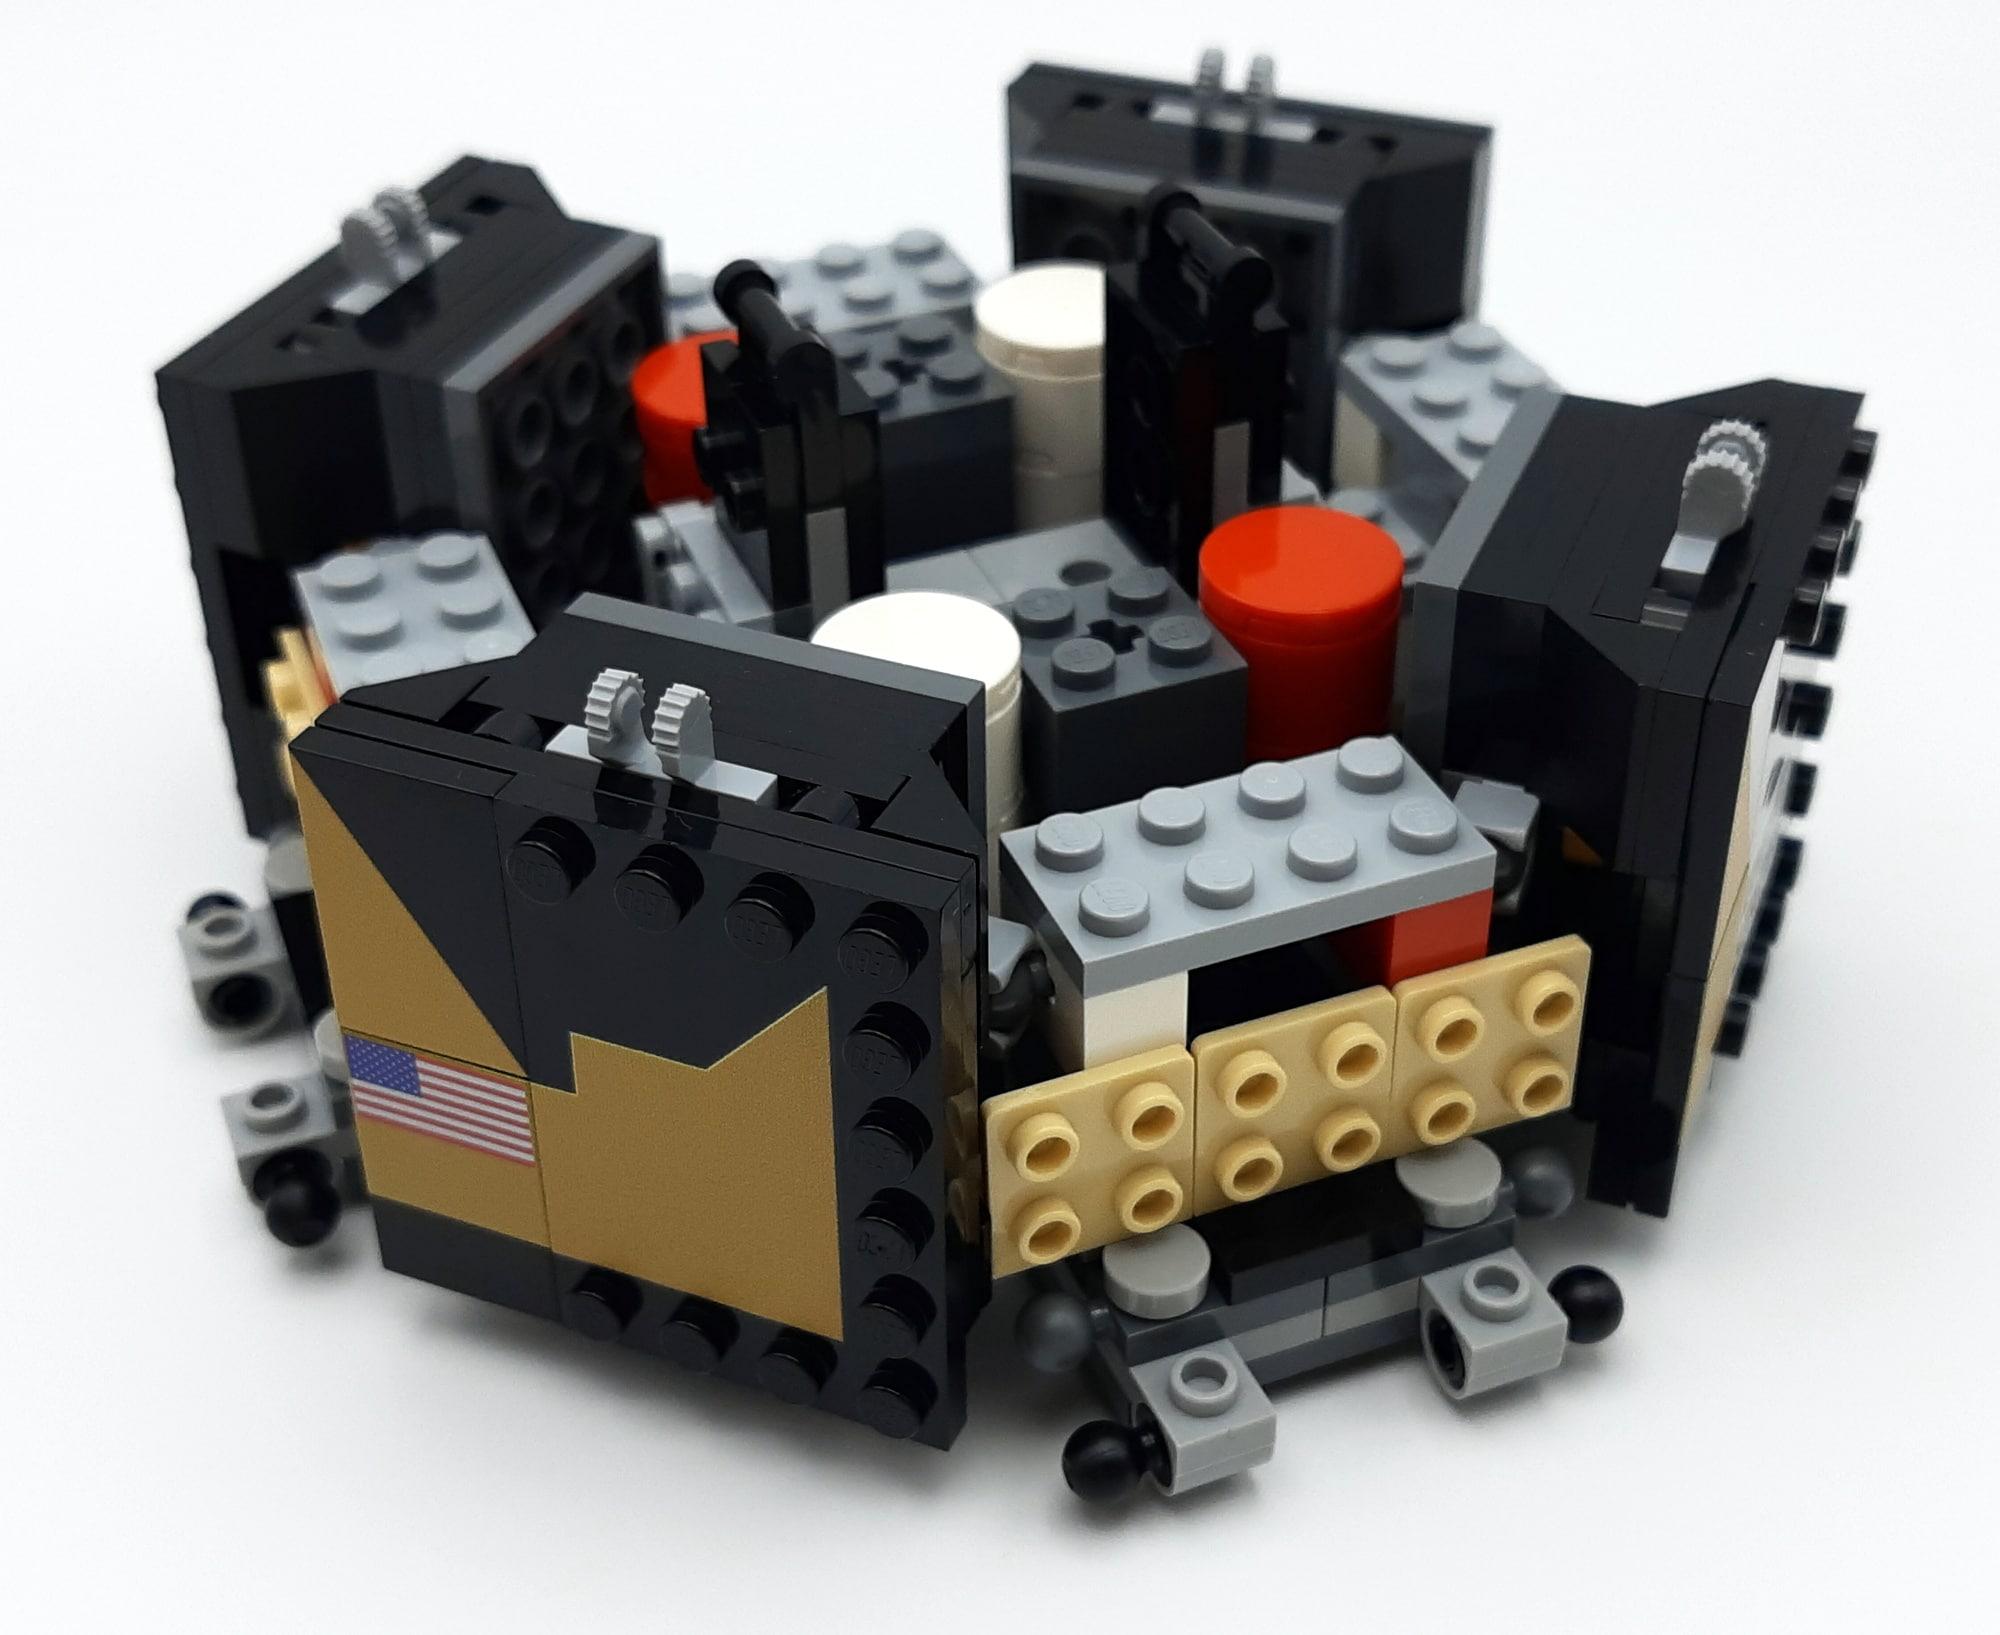 LEGO 10266 Nasa Apollo 11 Mondlandefähre - Bauabschnitt 2